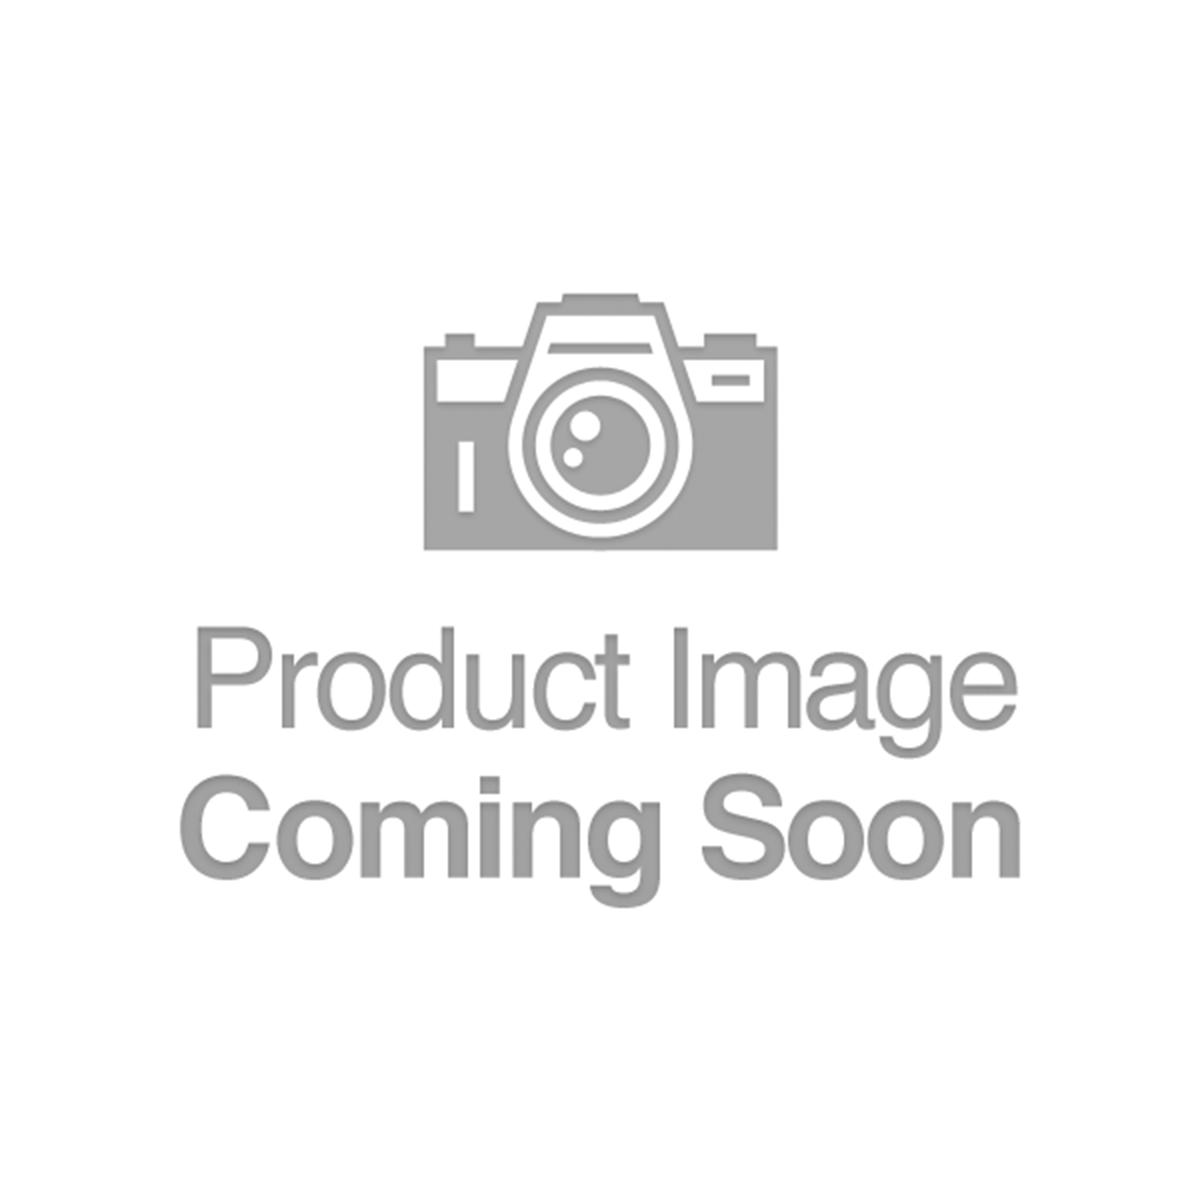 1866 3CN Three Cent Nickel PCGS MS64